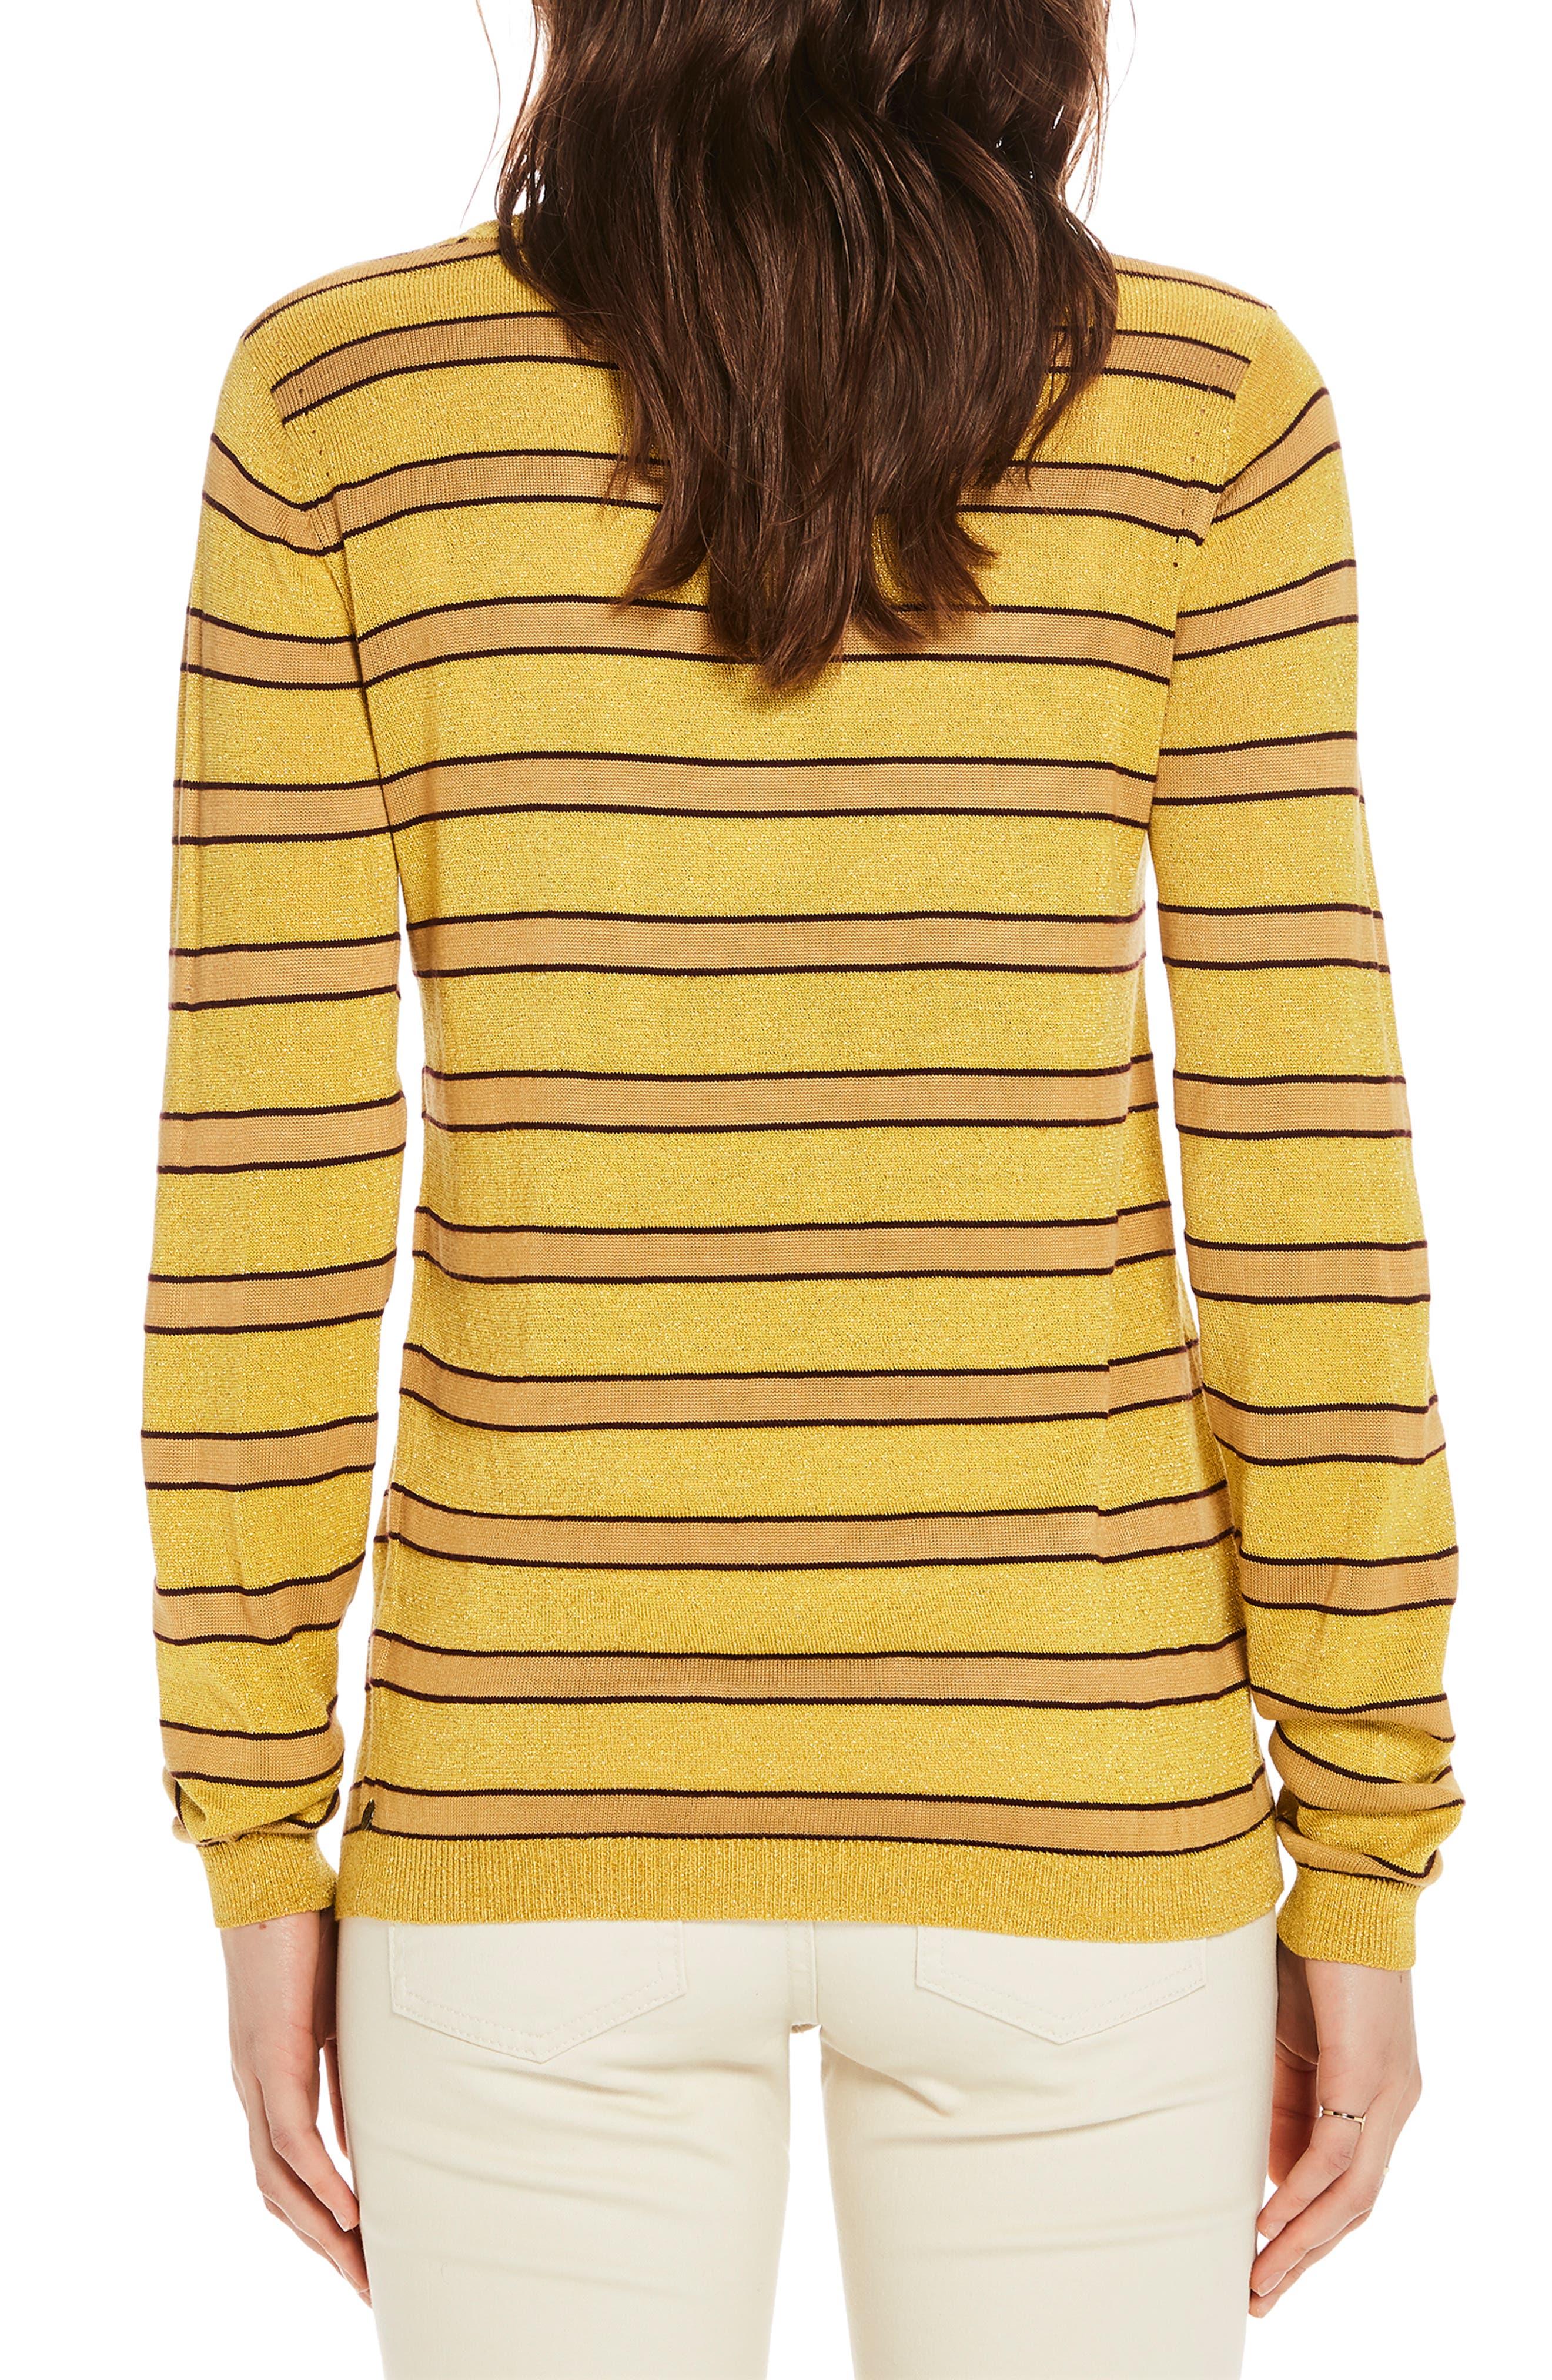 Stripe Crewneck Sweater,                             Alternate thumbnail 2, color,                             730